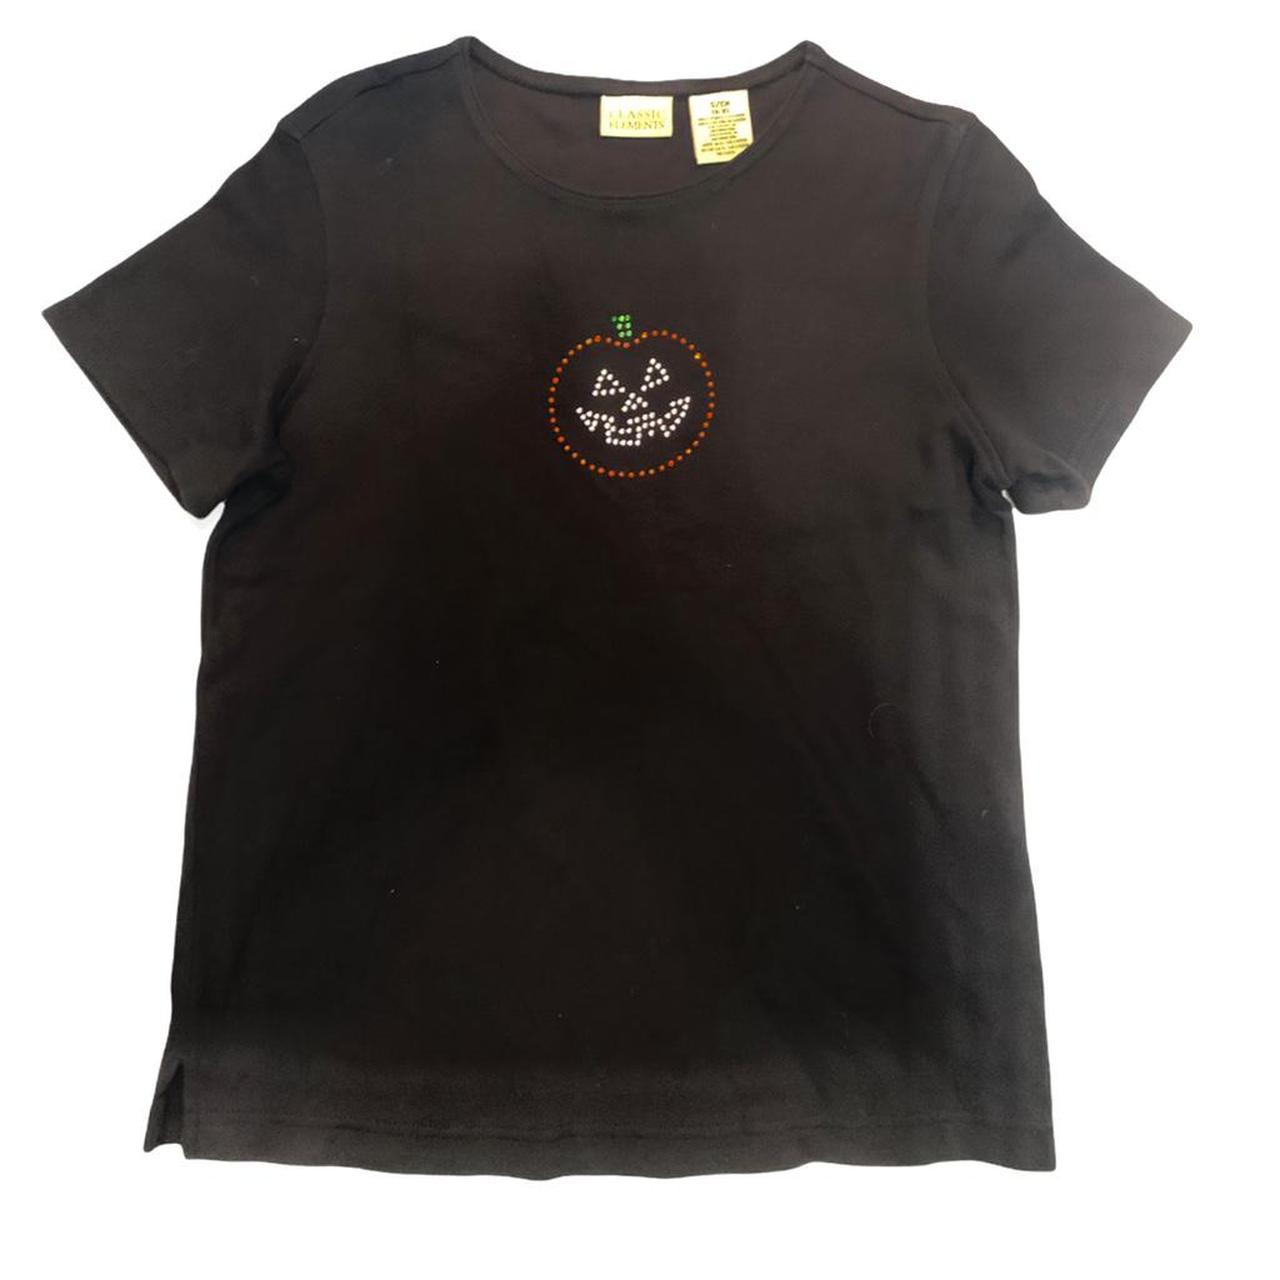 Product Image 1 - Vintage Halloween pumpkin shirt rhinestone